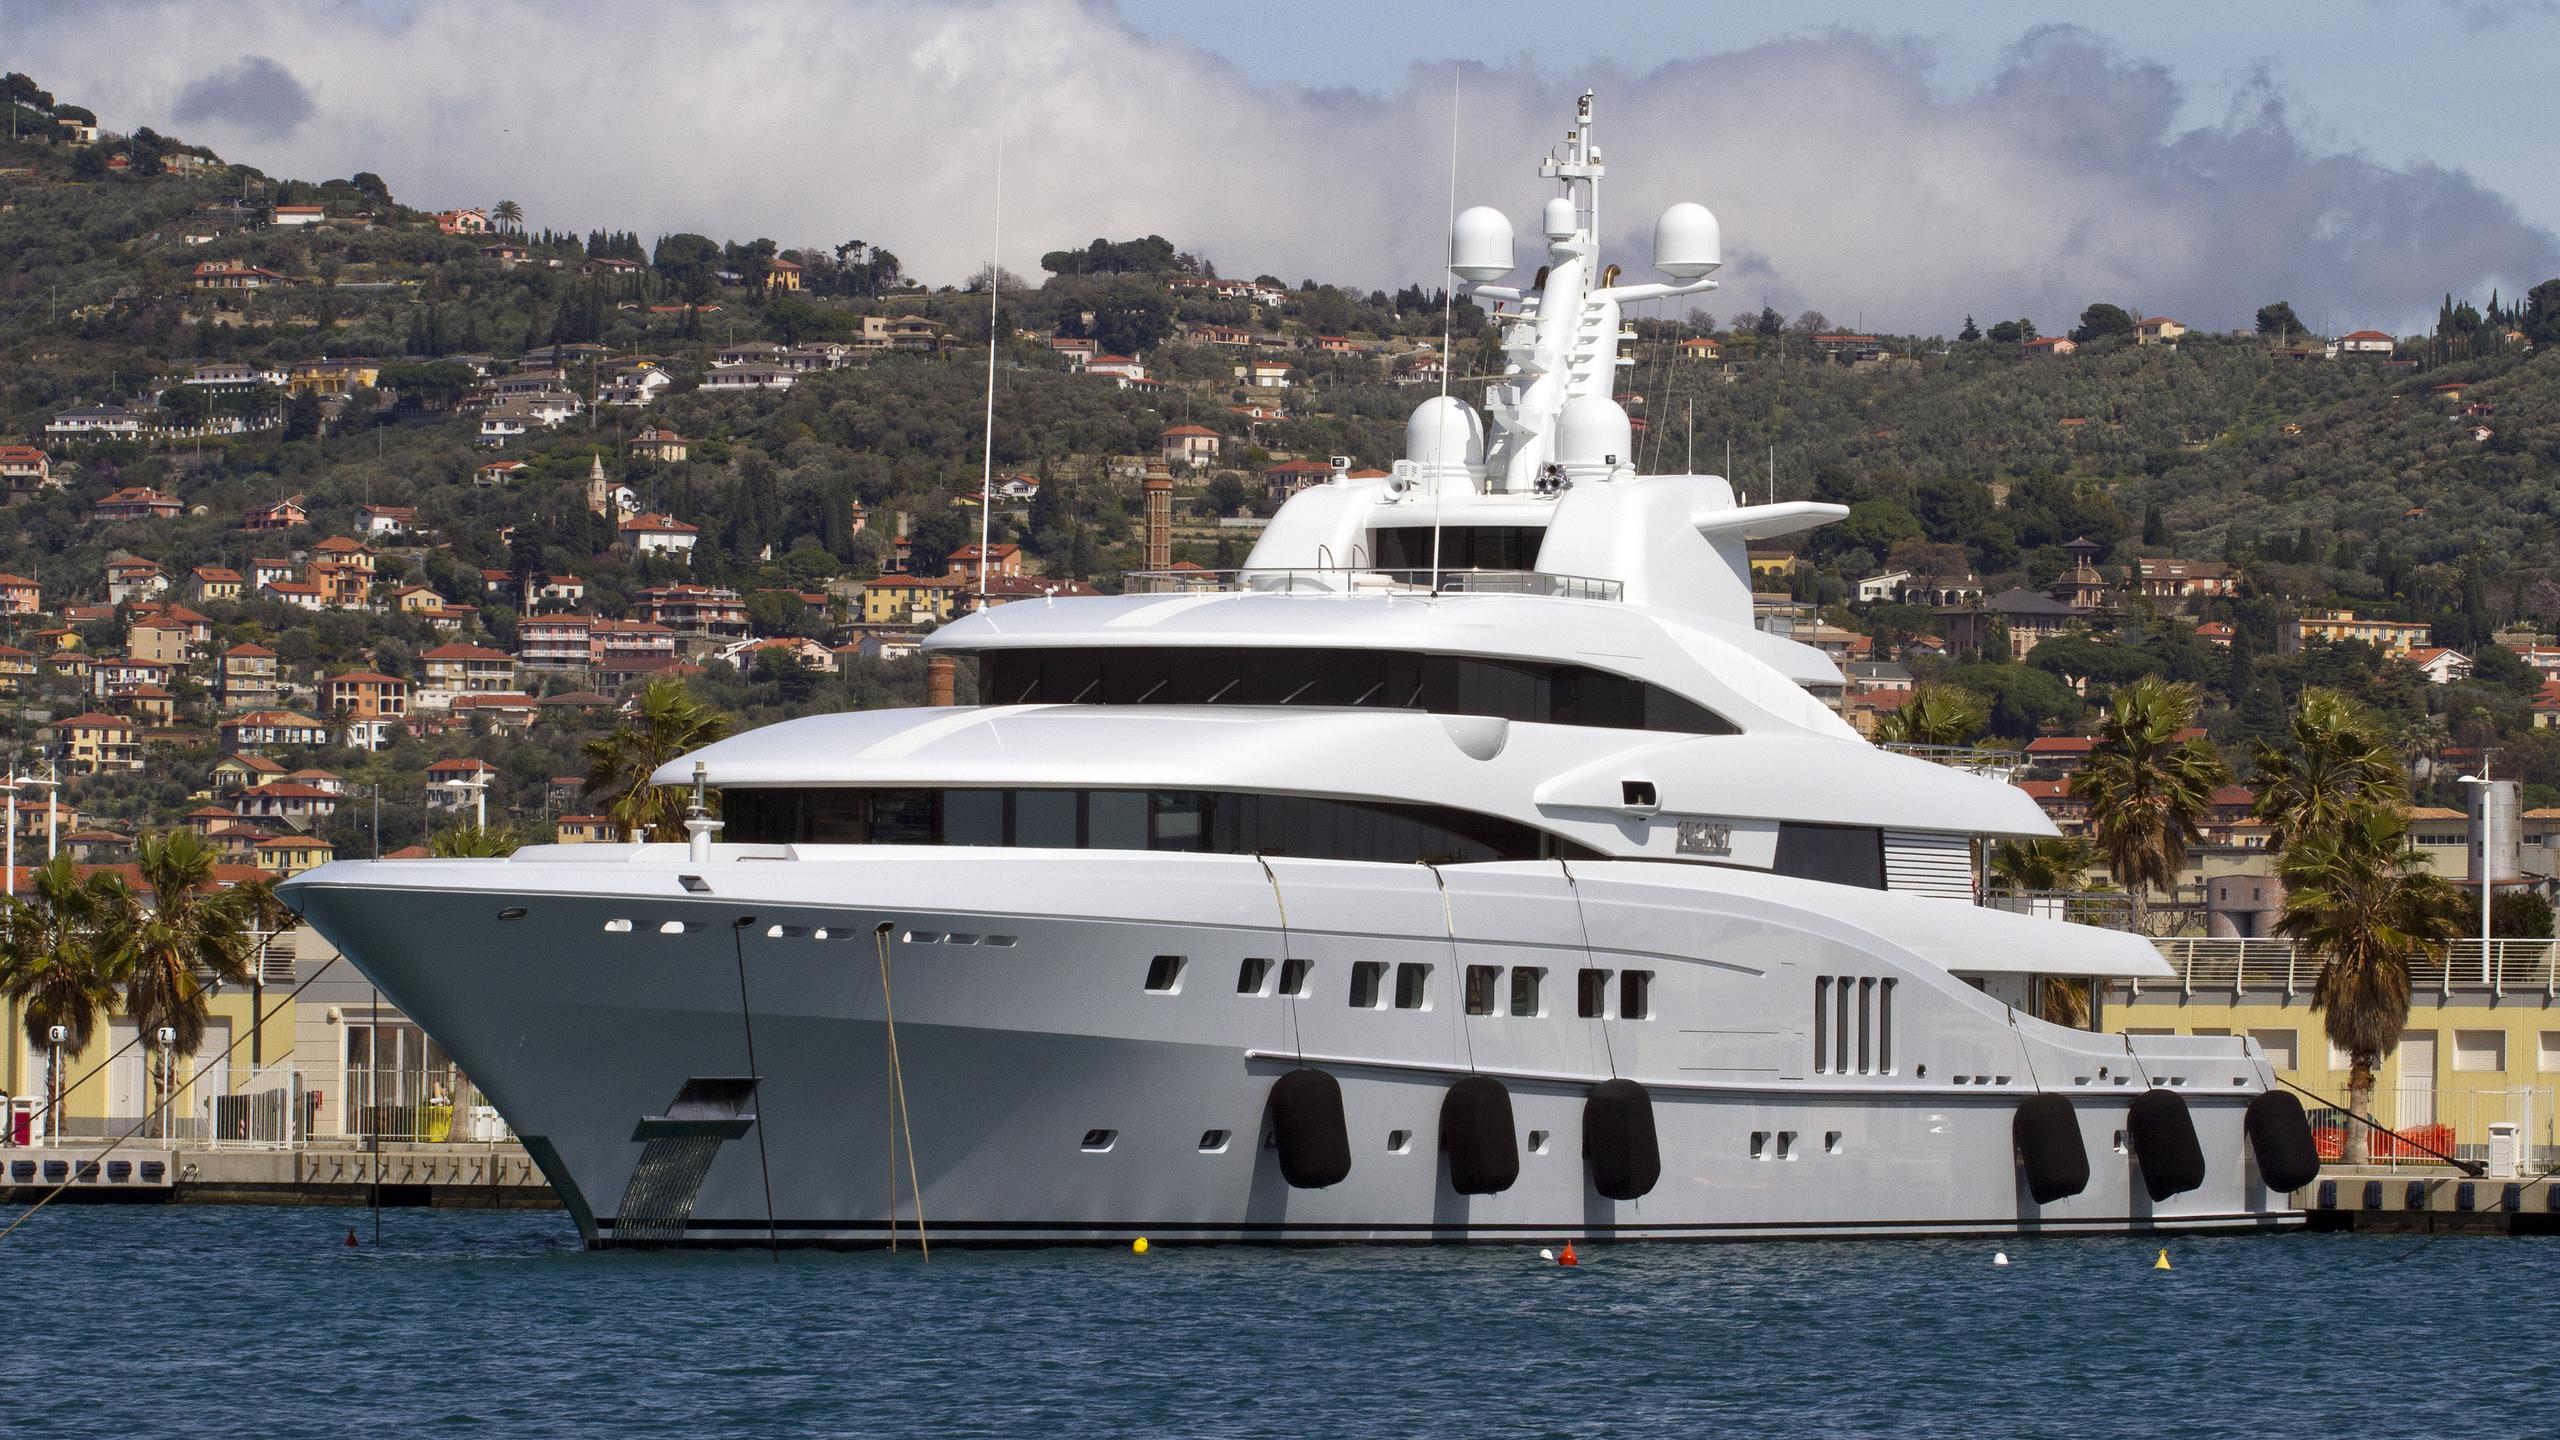 secret-motor-yacht-abeking-rasmusssen-2013-82m-bow-profile